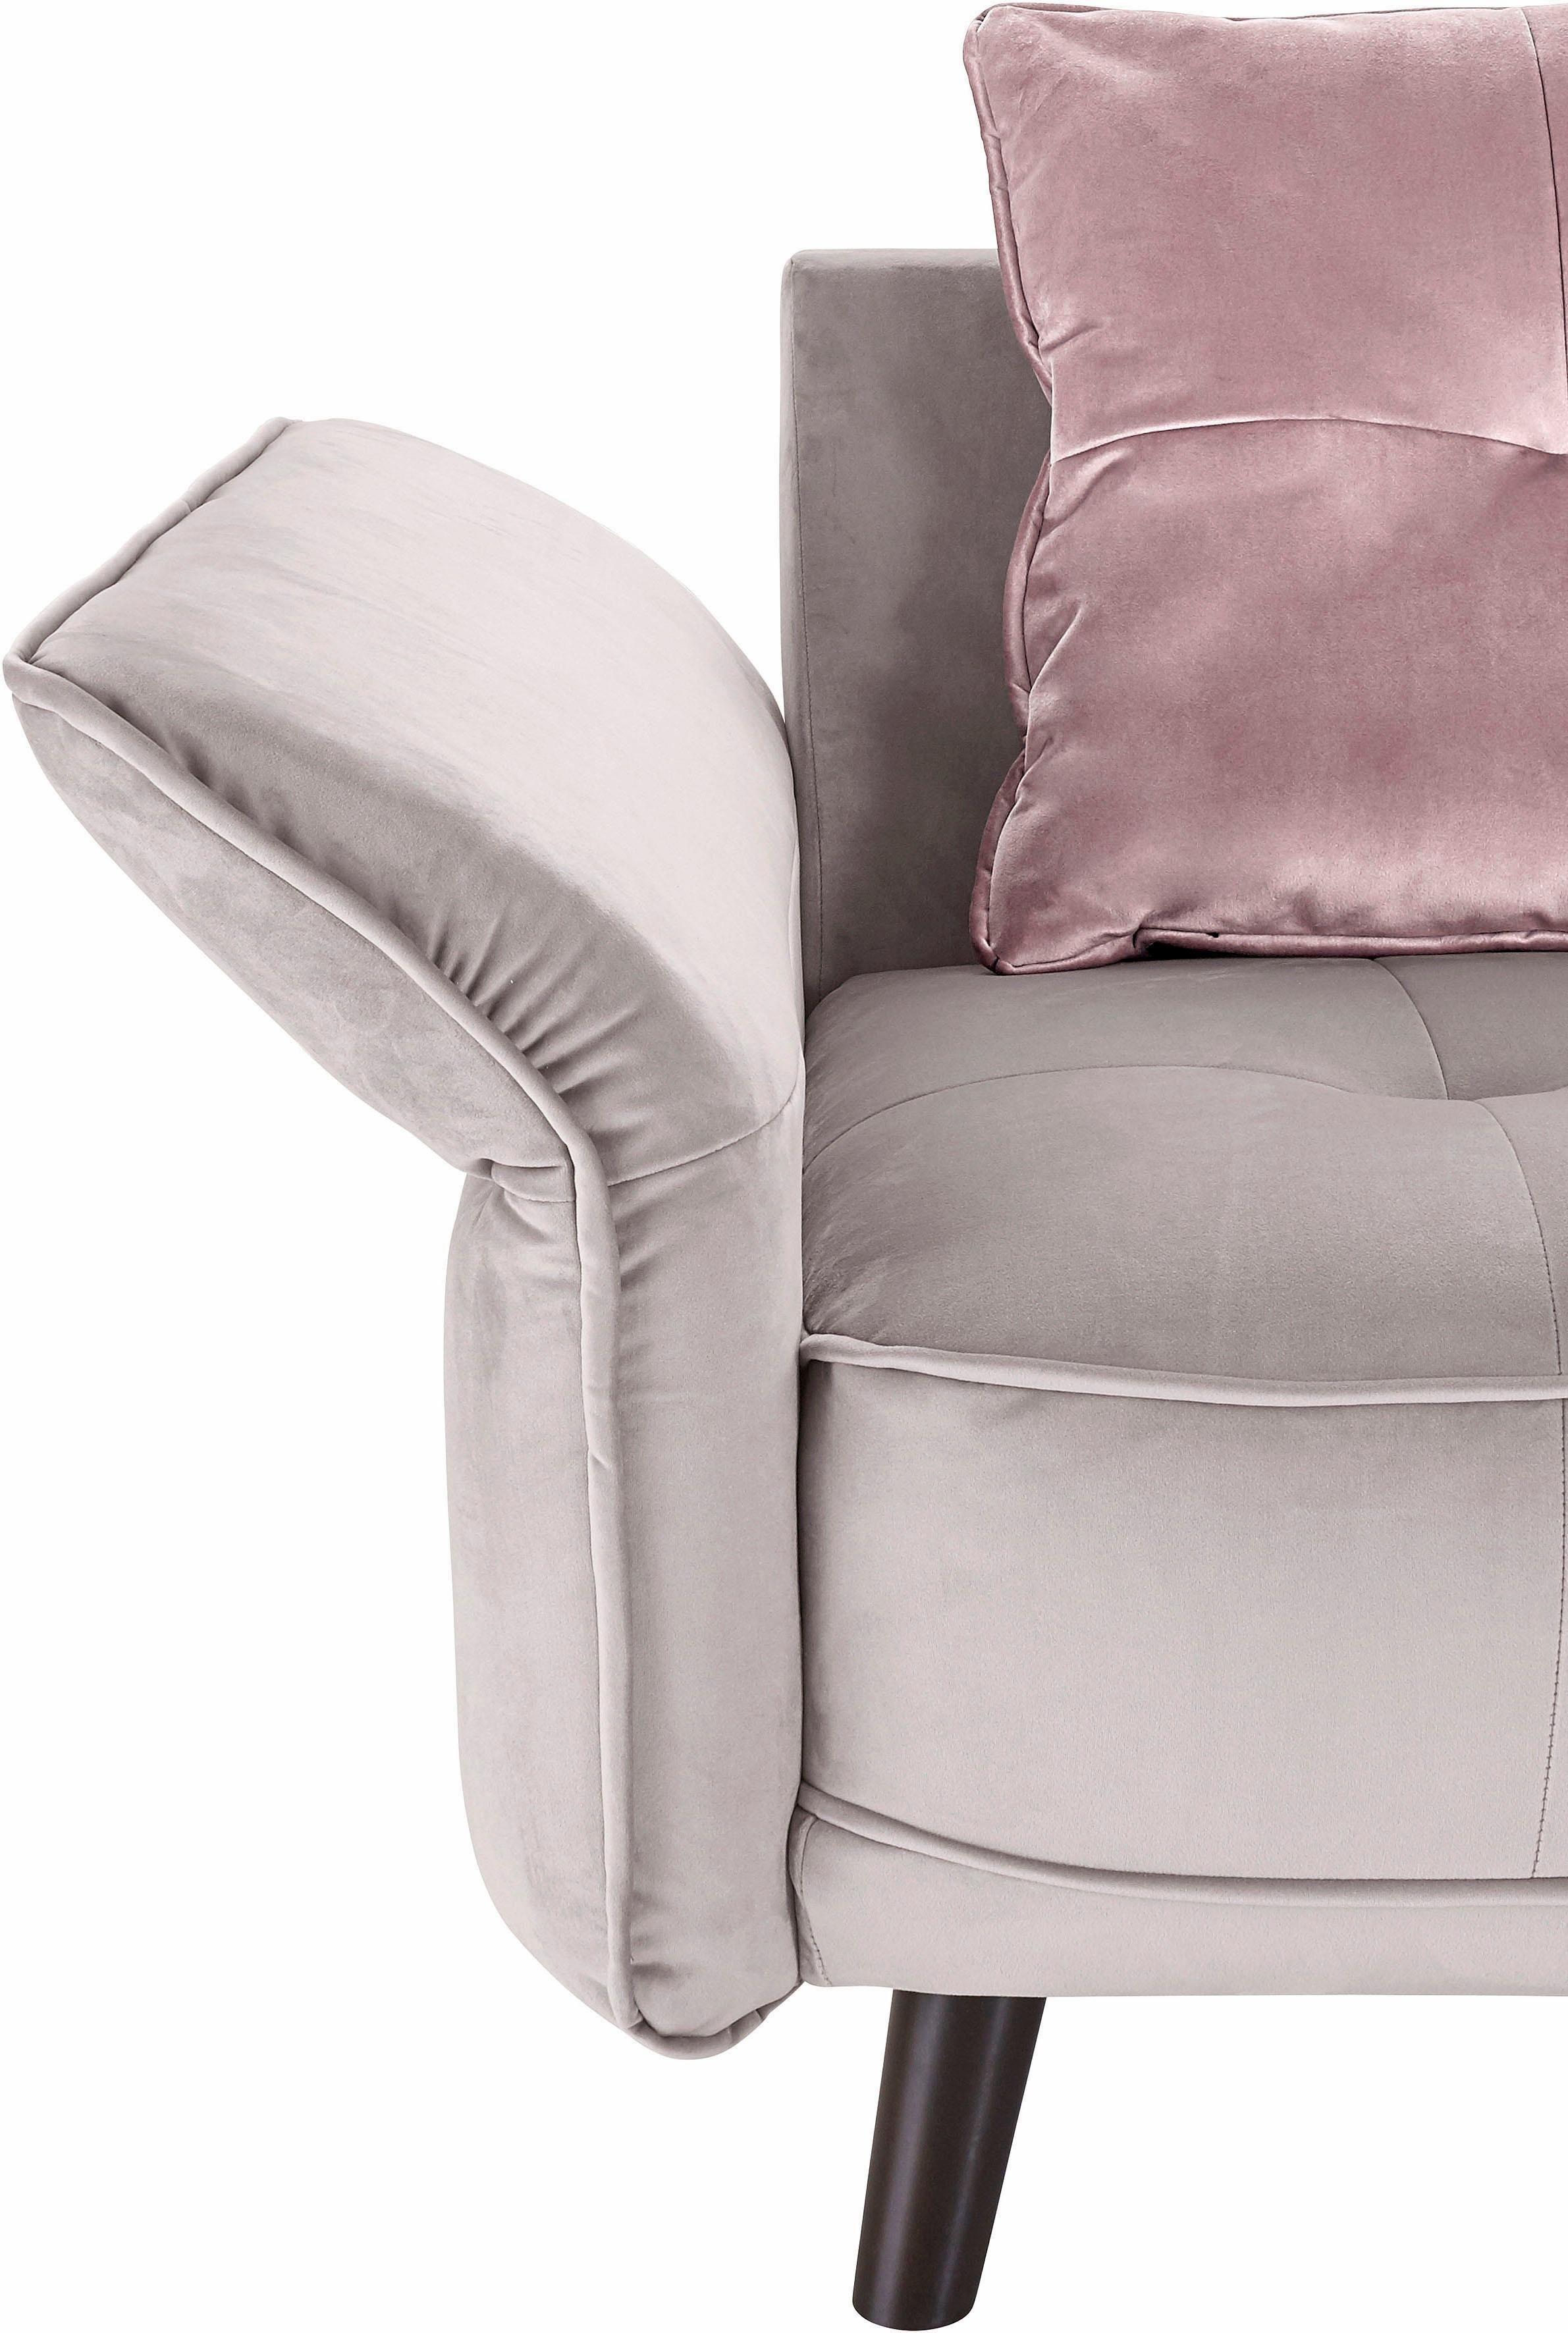 Inosign Ecksofa Charming Kaufen Sofa Ecksofa Und Kissen